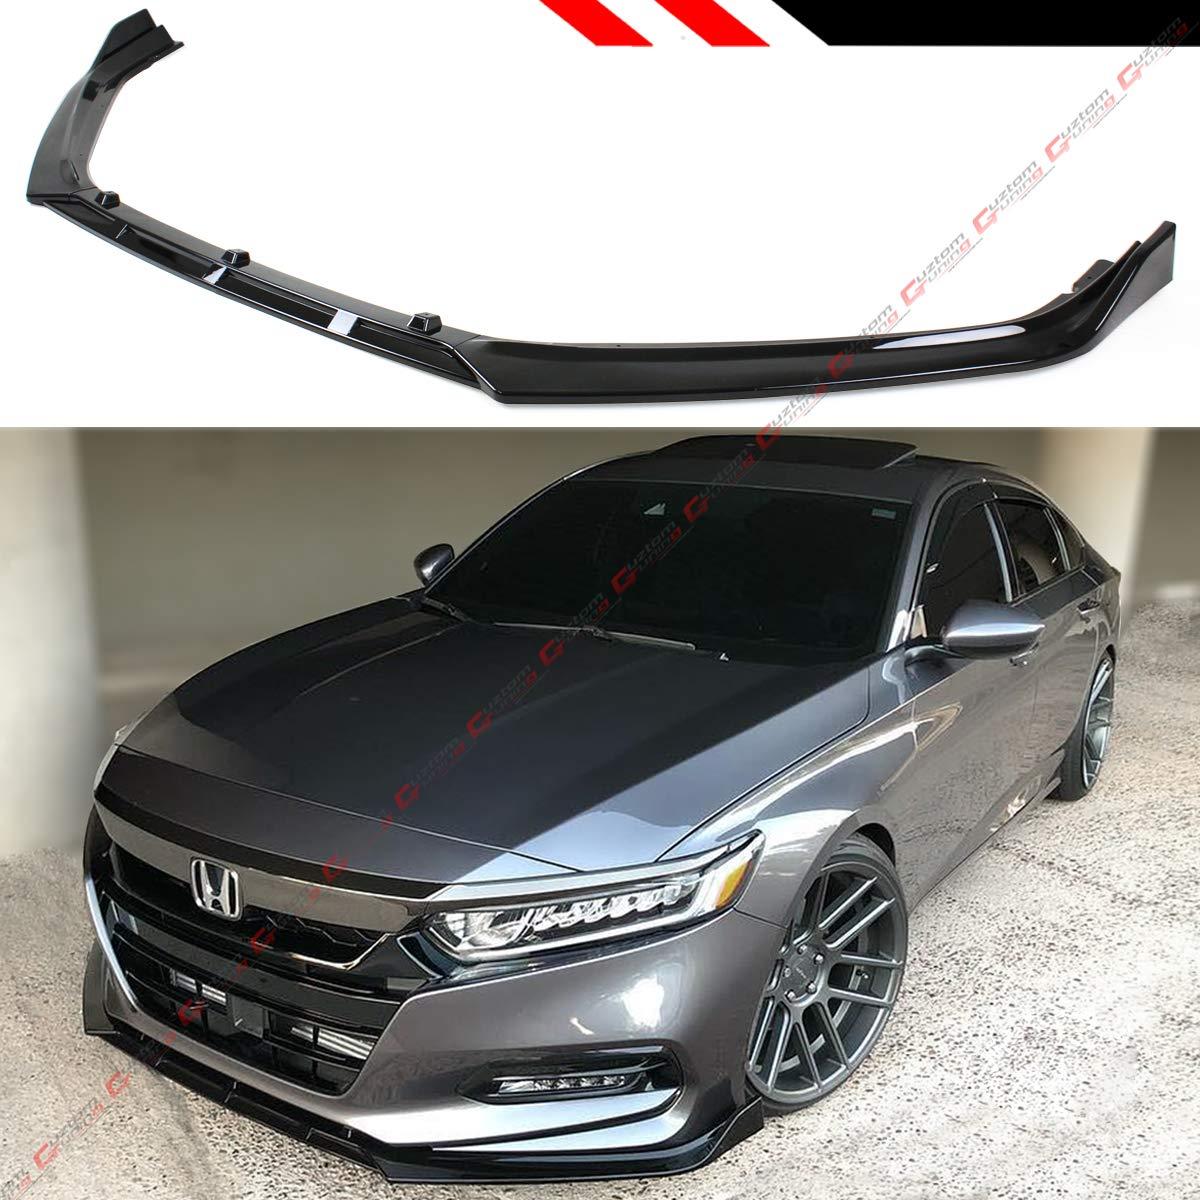 2019 Honda Accord >> Fits For 2018 2019 Honda Accord 10th Gen Sport Jdm 3 Piecesdesign Front Bumper Lip Splitter Gloss Black